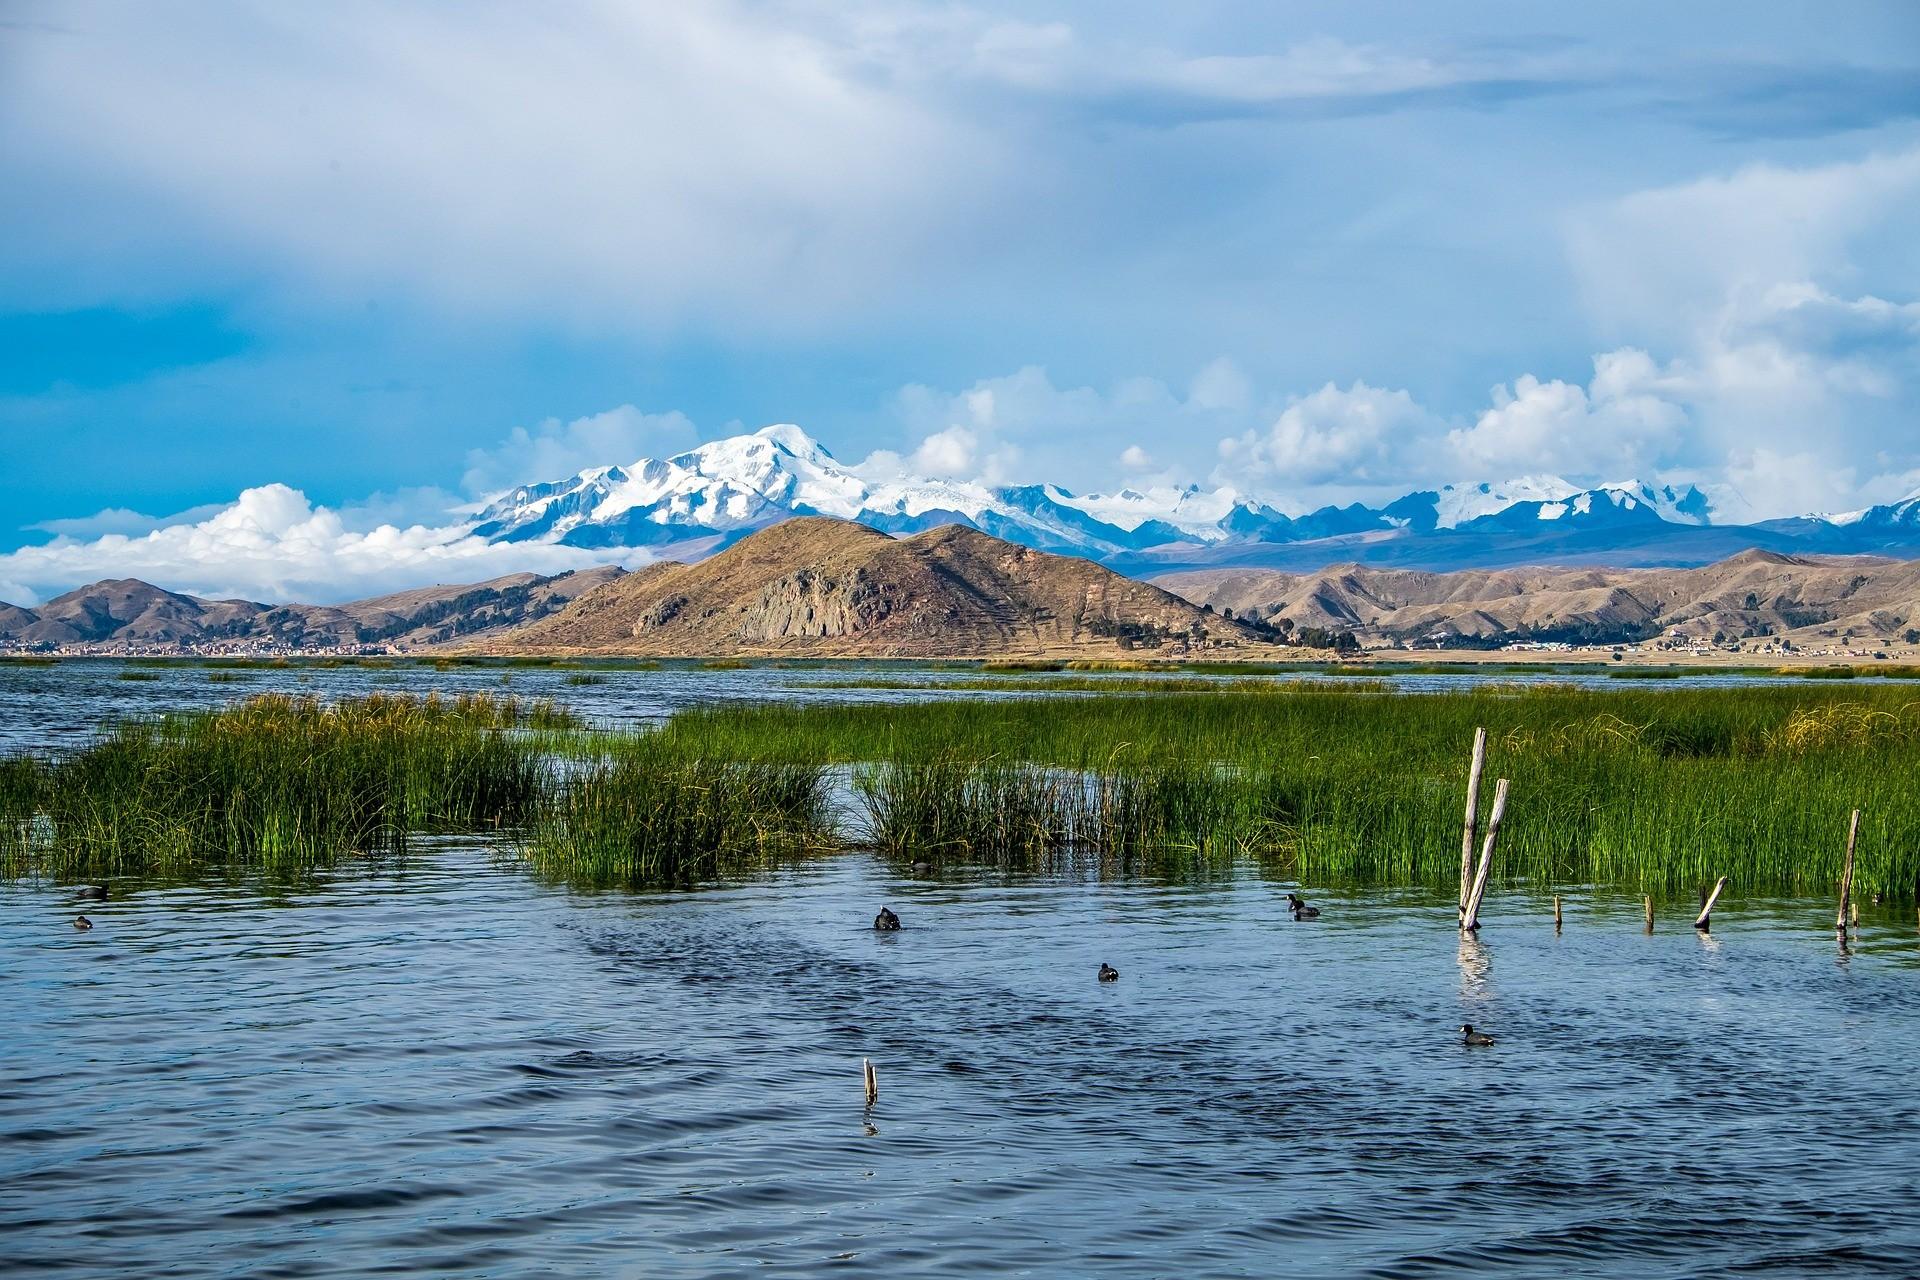 lake-titicaca-2494522_1920